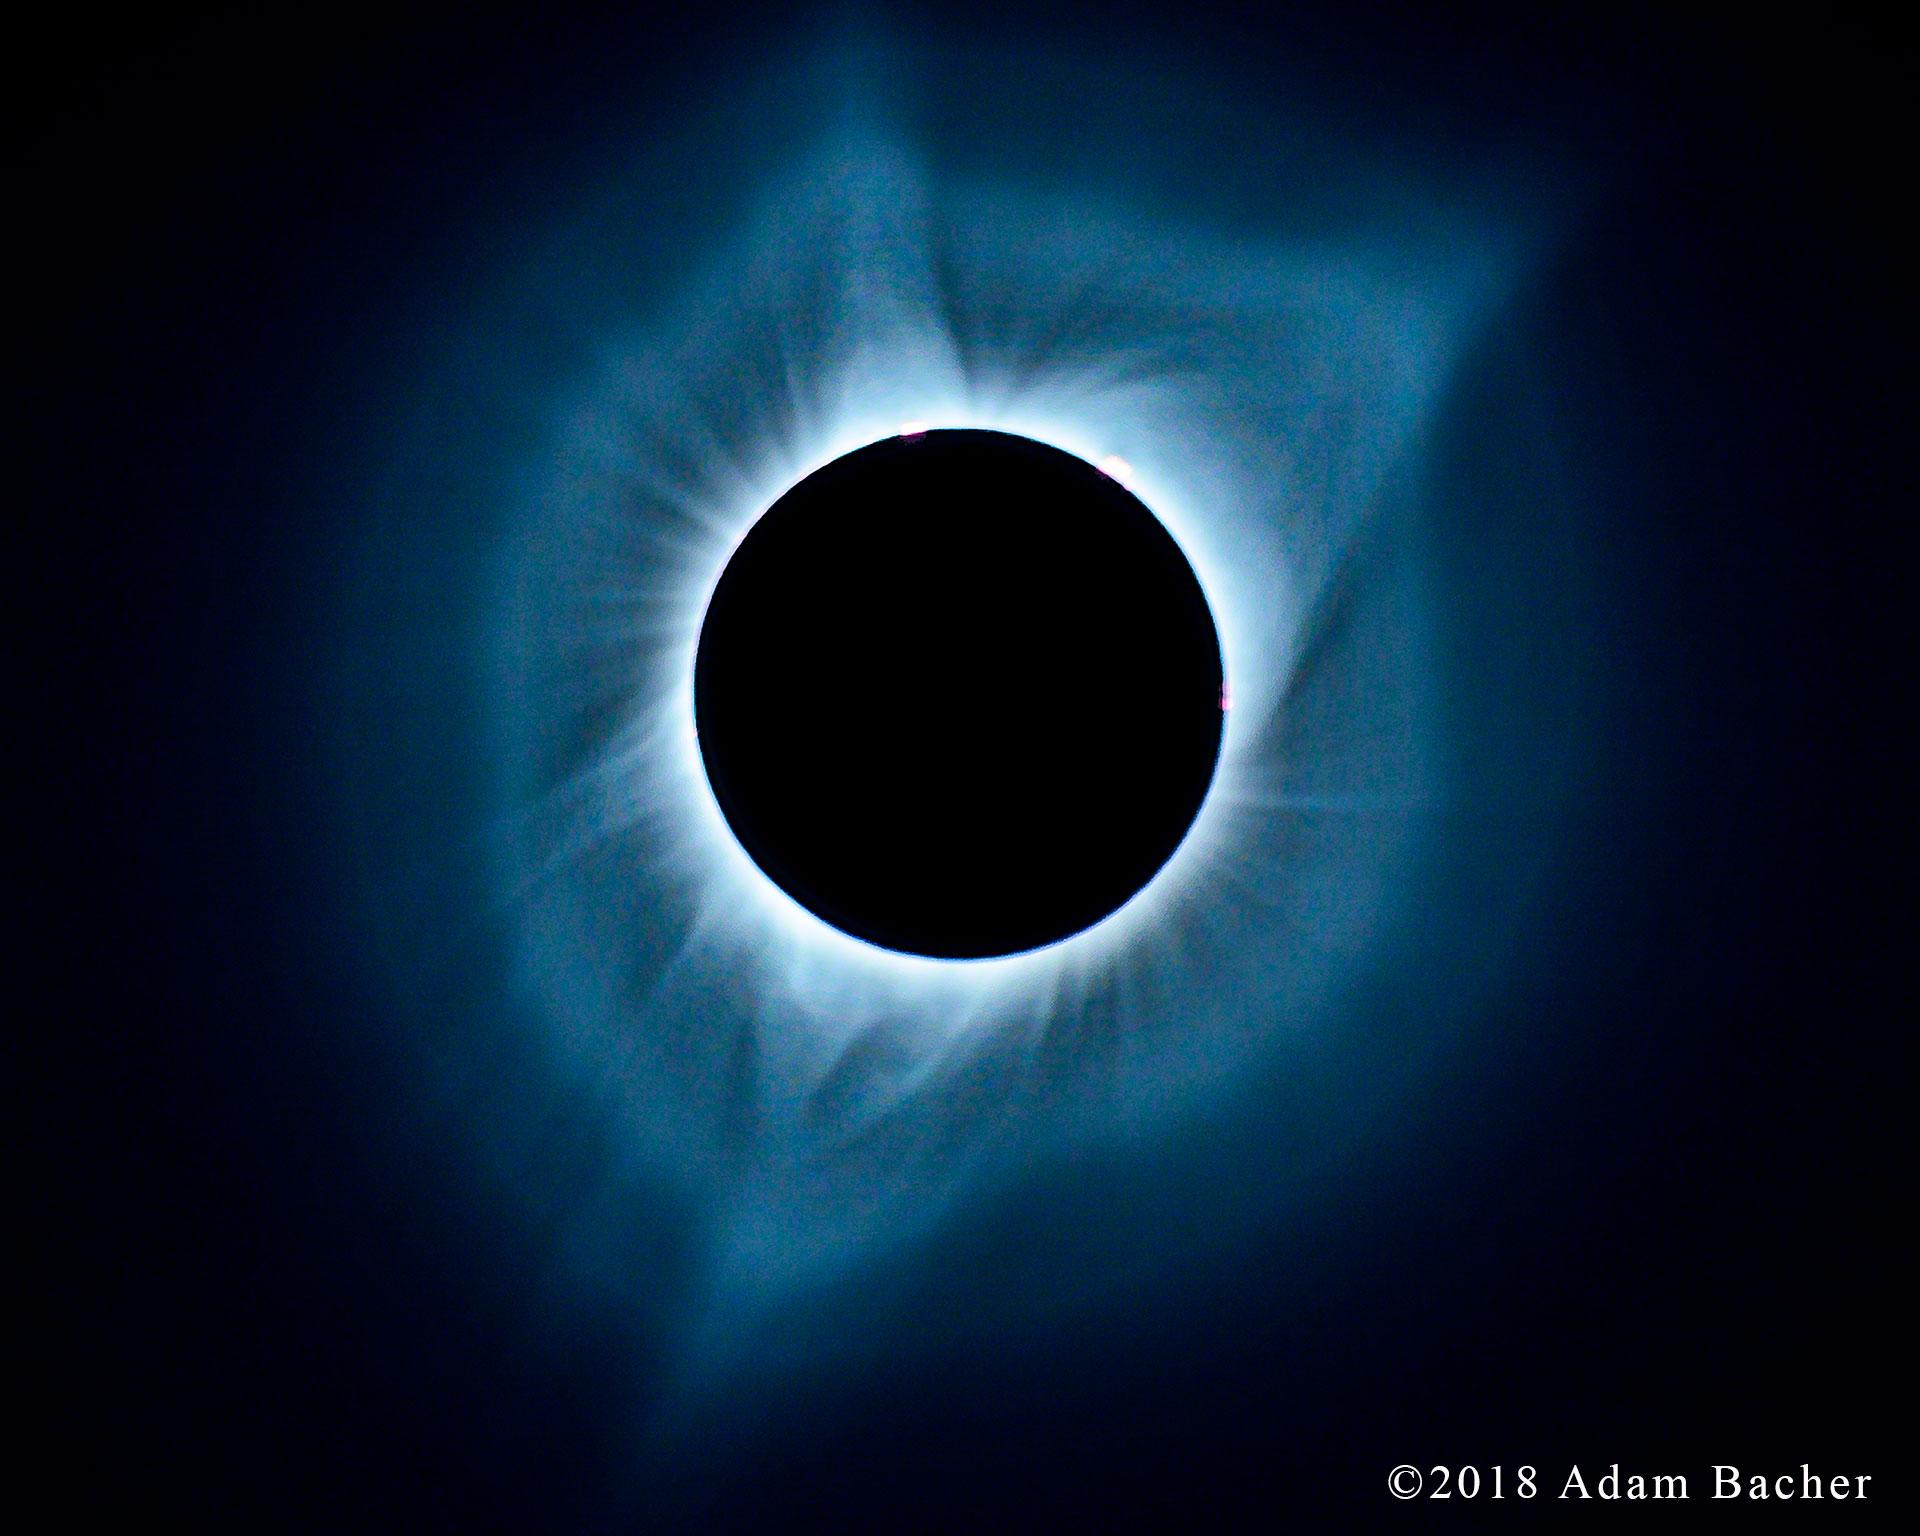 Even on the Darkest Days, the Light Always Shines Through – Total Eclipse